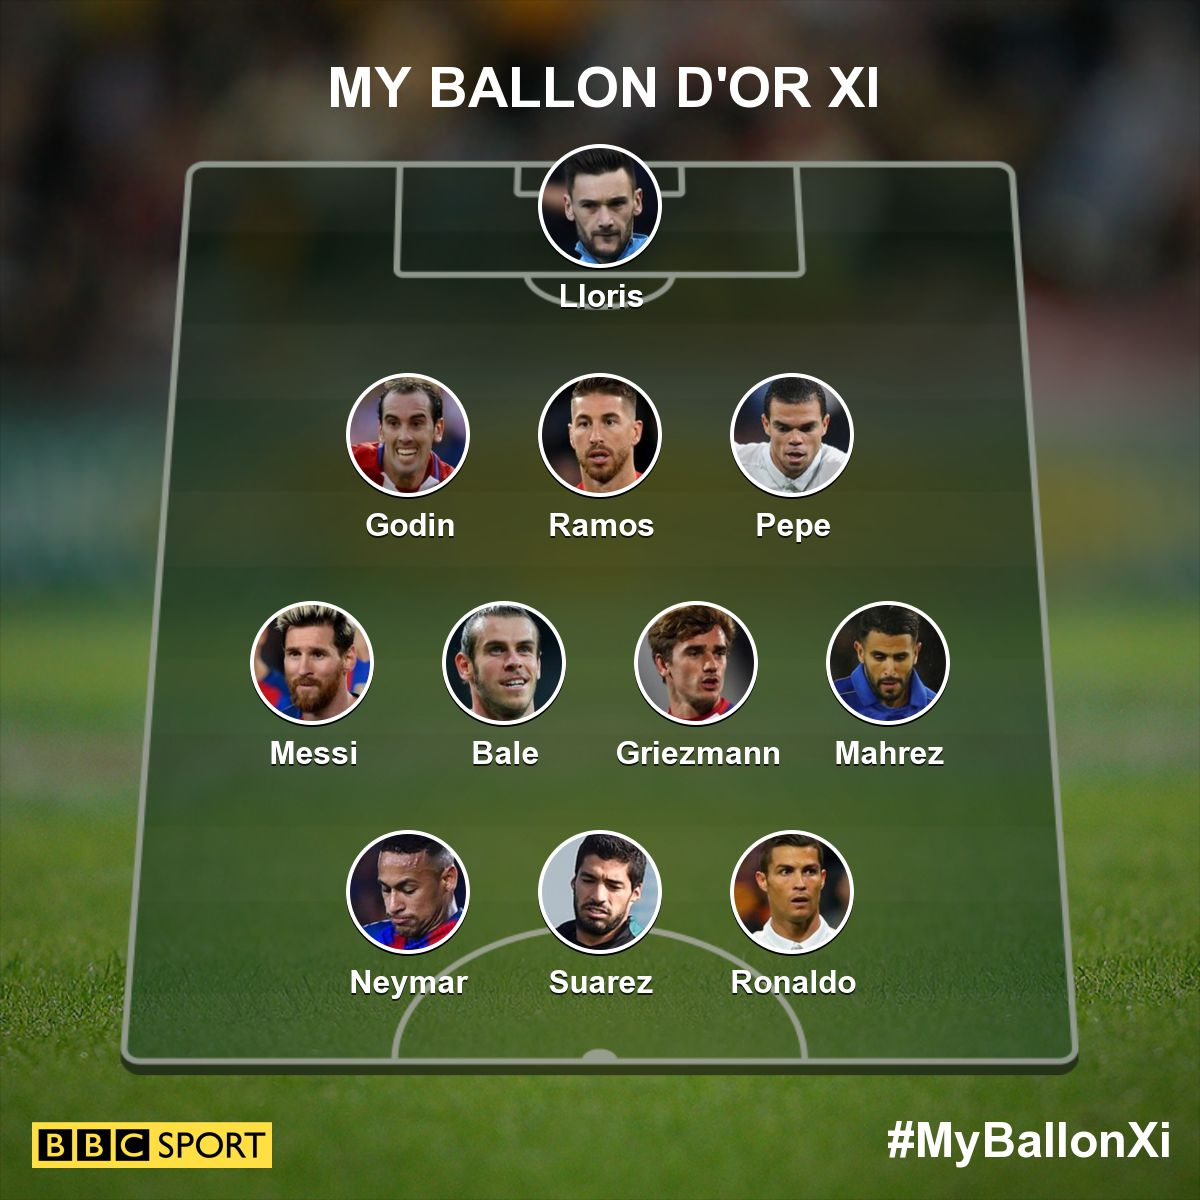 ballon-dor-xi-9f4e8c802fa7cc37e8ace71f3f